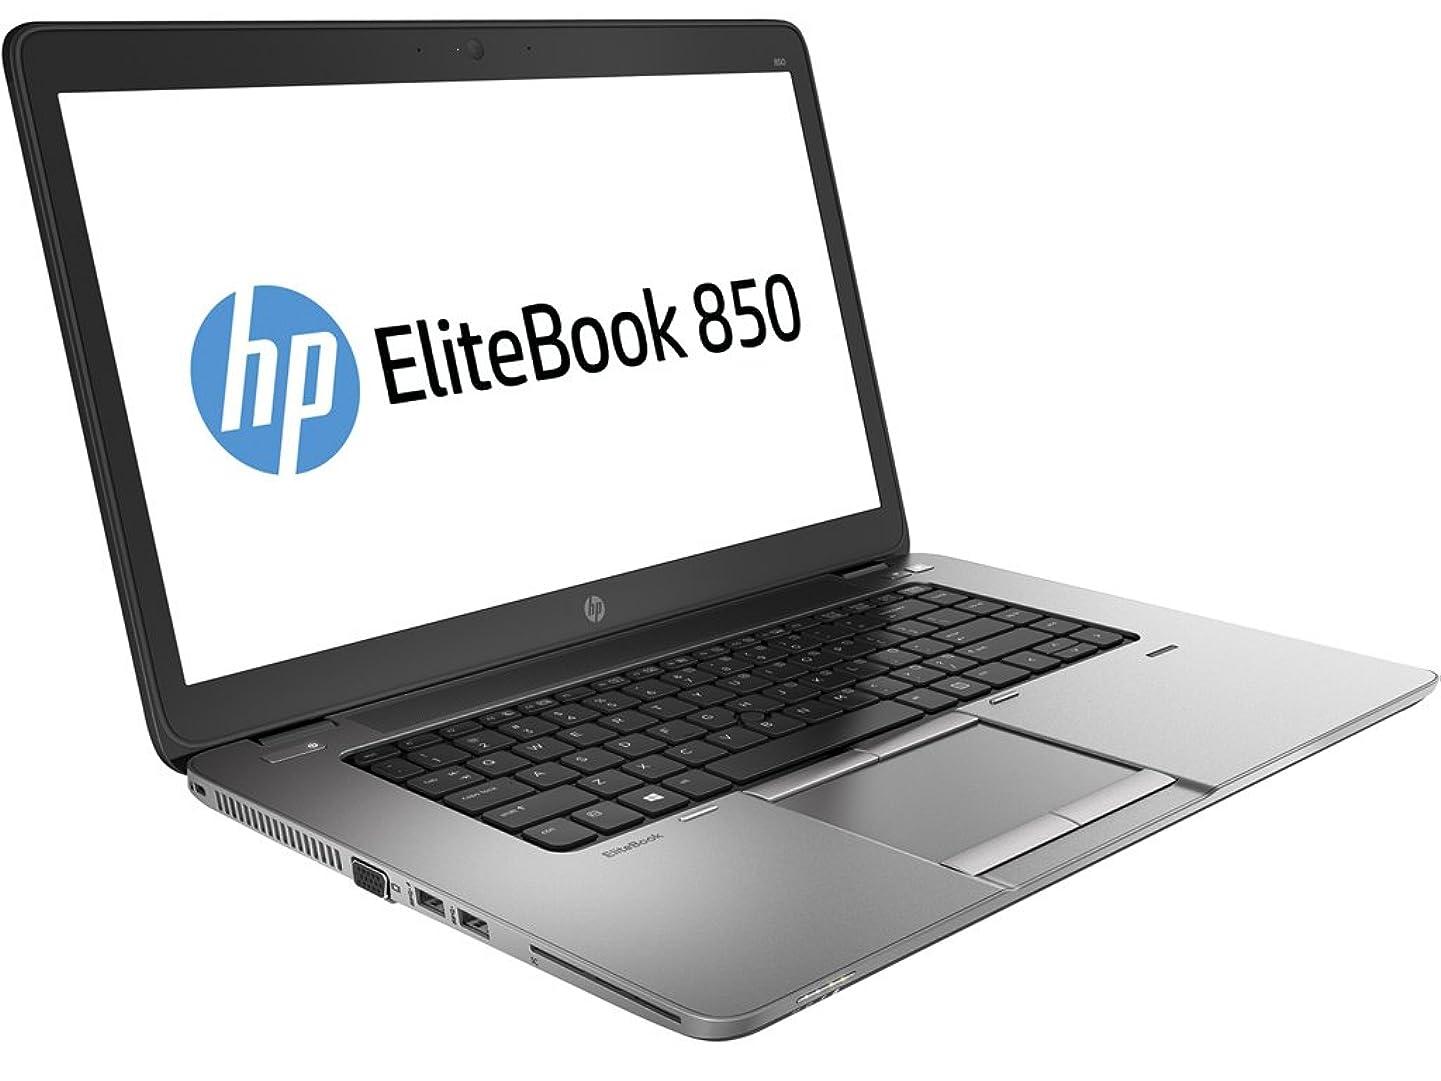 HP EliteBook 850 G2 15.6in Laptop, Core i5-5200U 2.2GHz, 8GB Ram, 256GB SSD, Windows 10 Pro 64bit (Renewed)